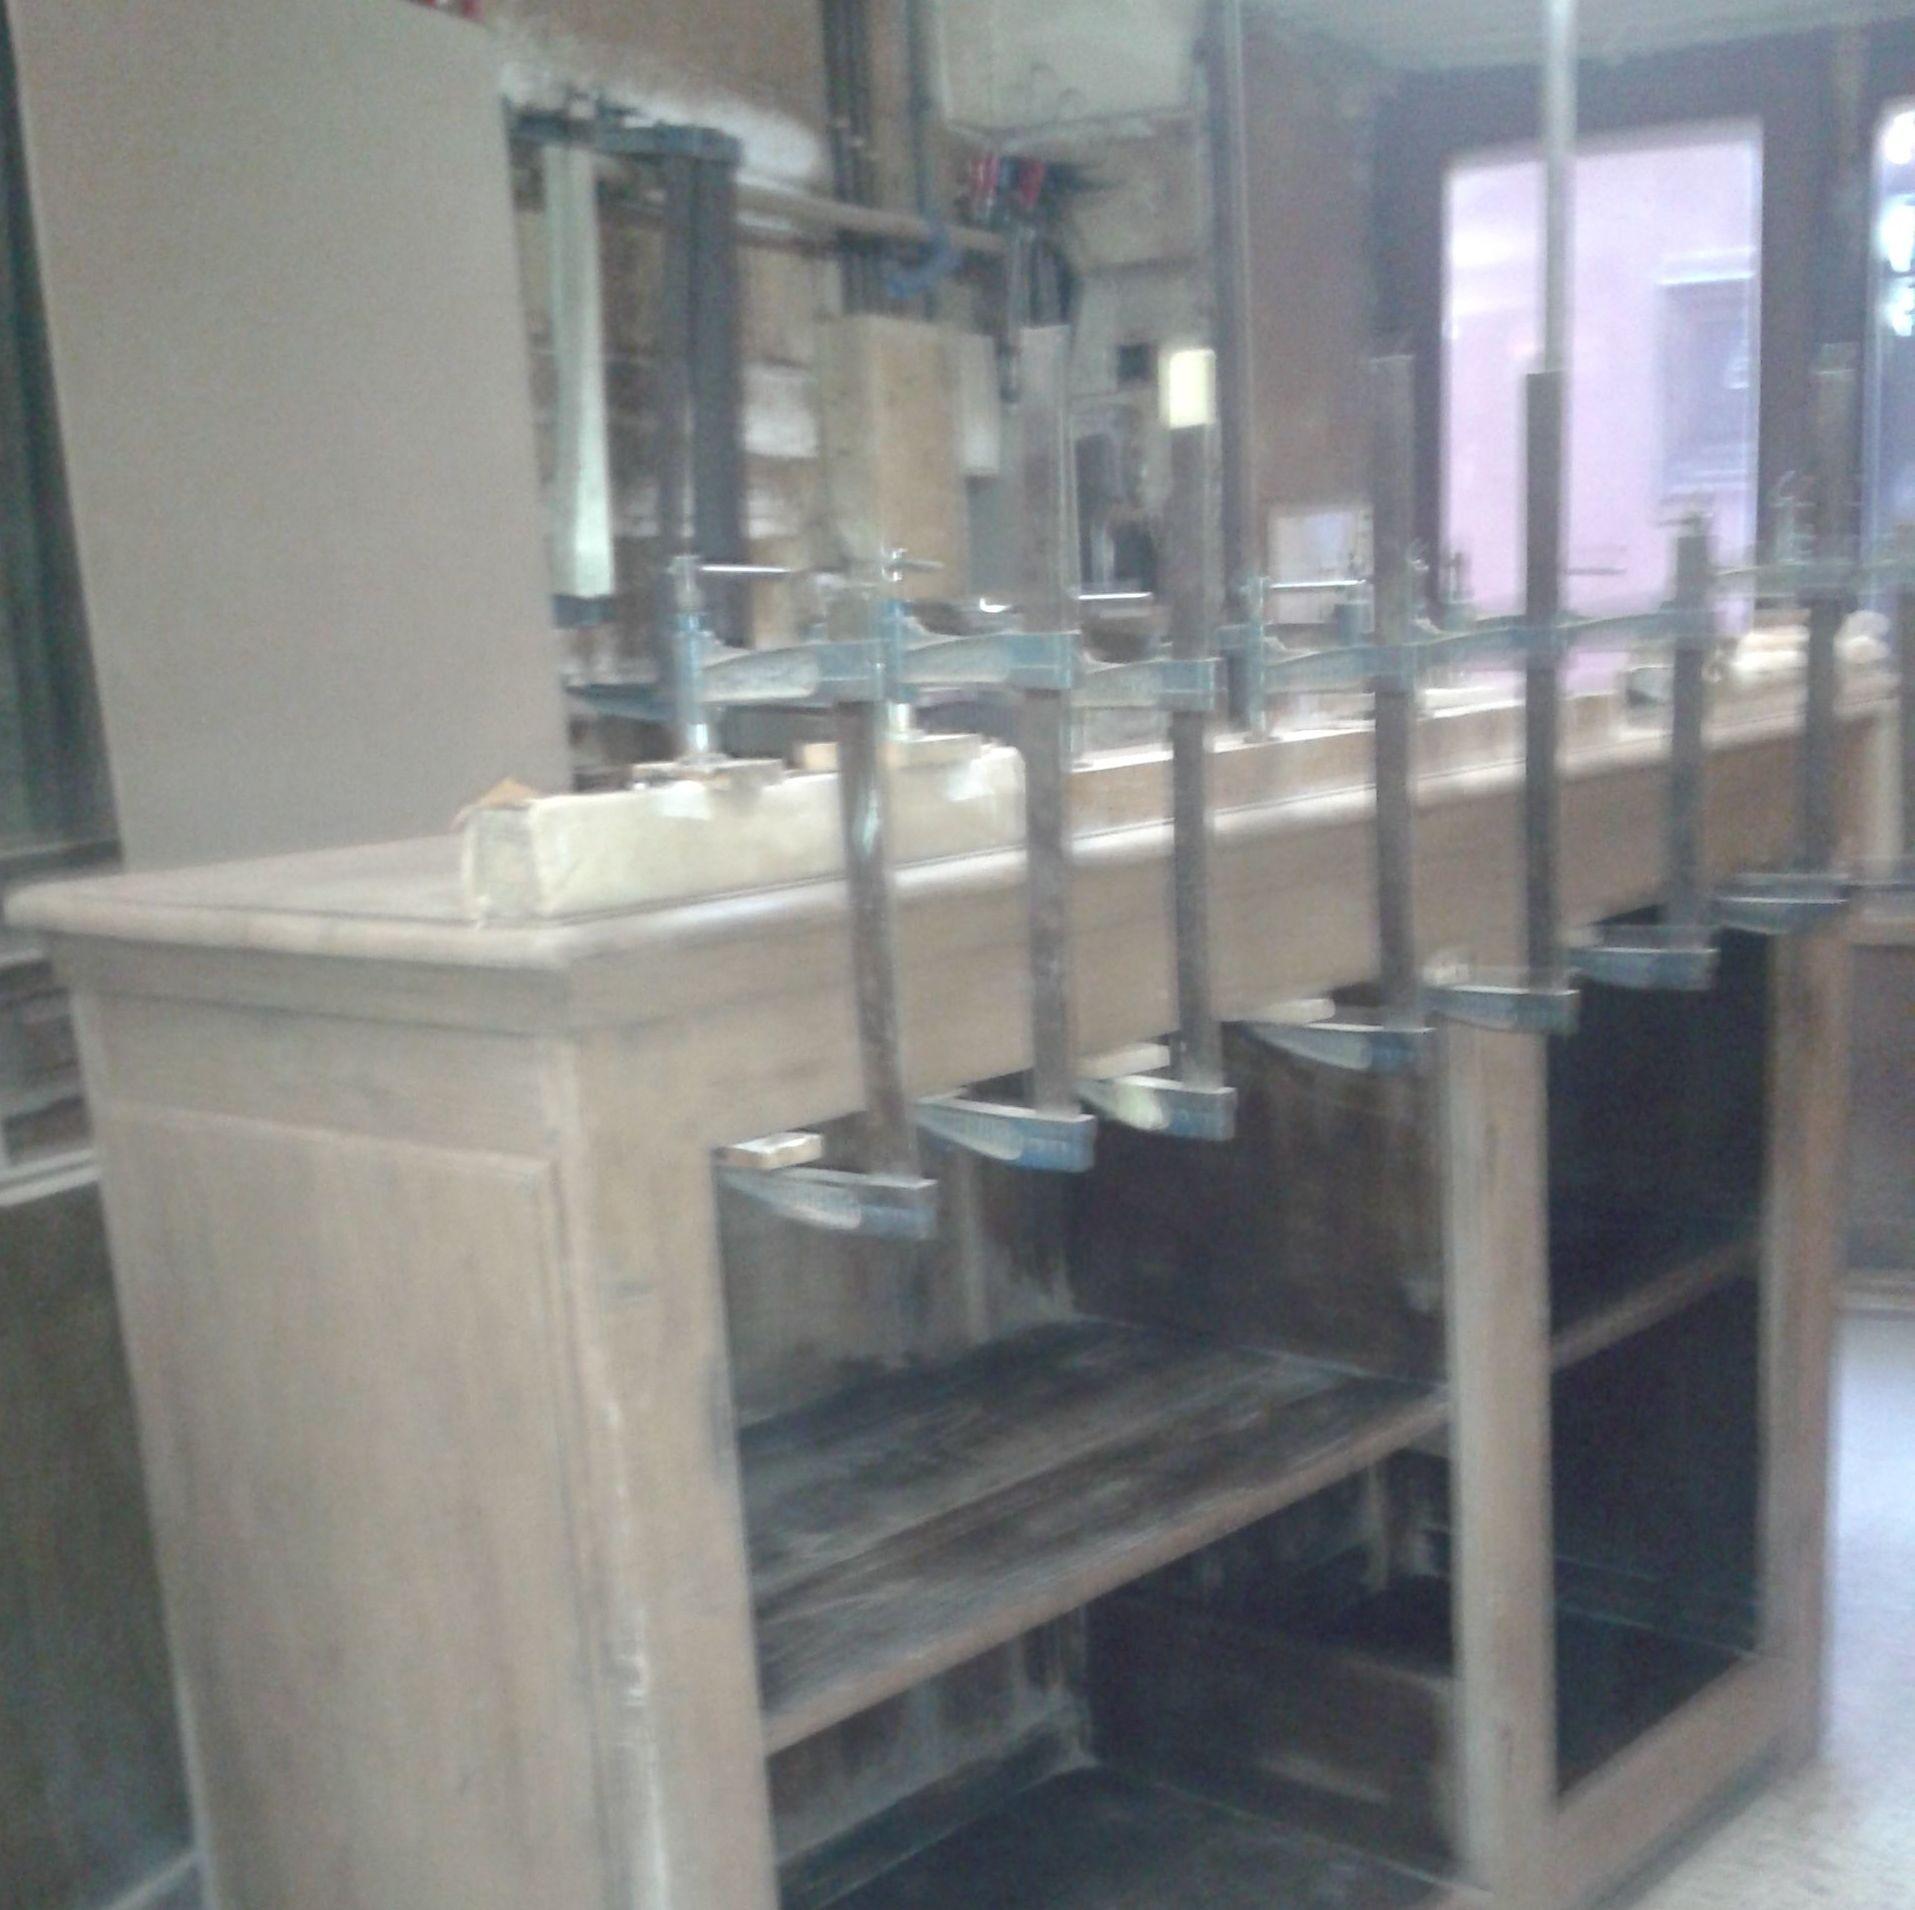 Foto 10 de Restauración de muebles en Pamplona | Lendik Restauración